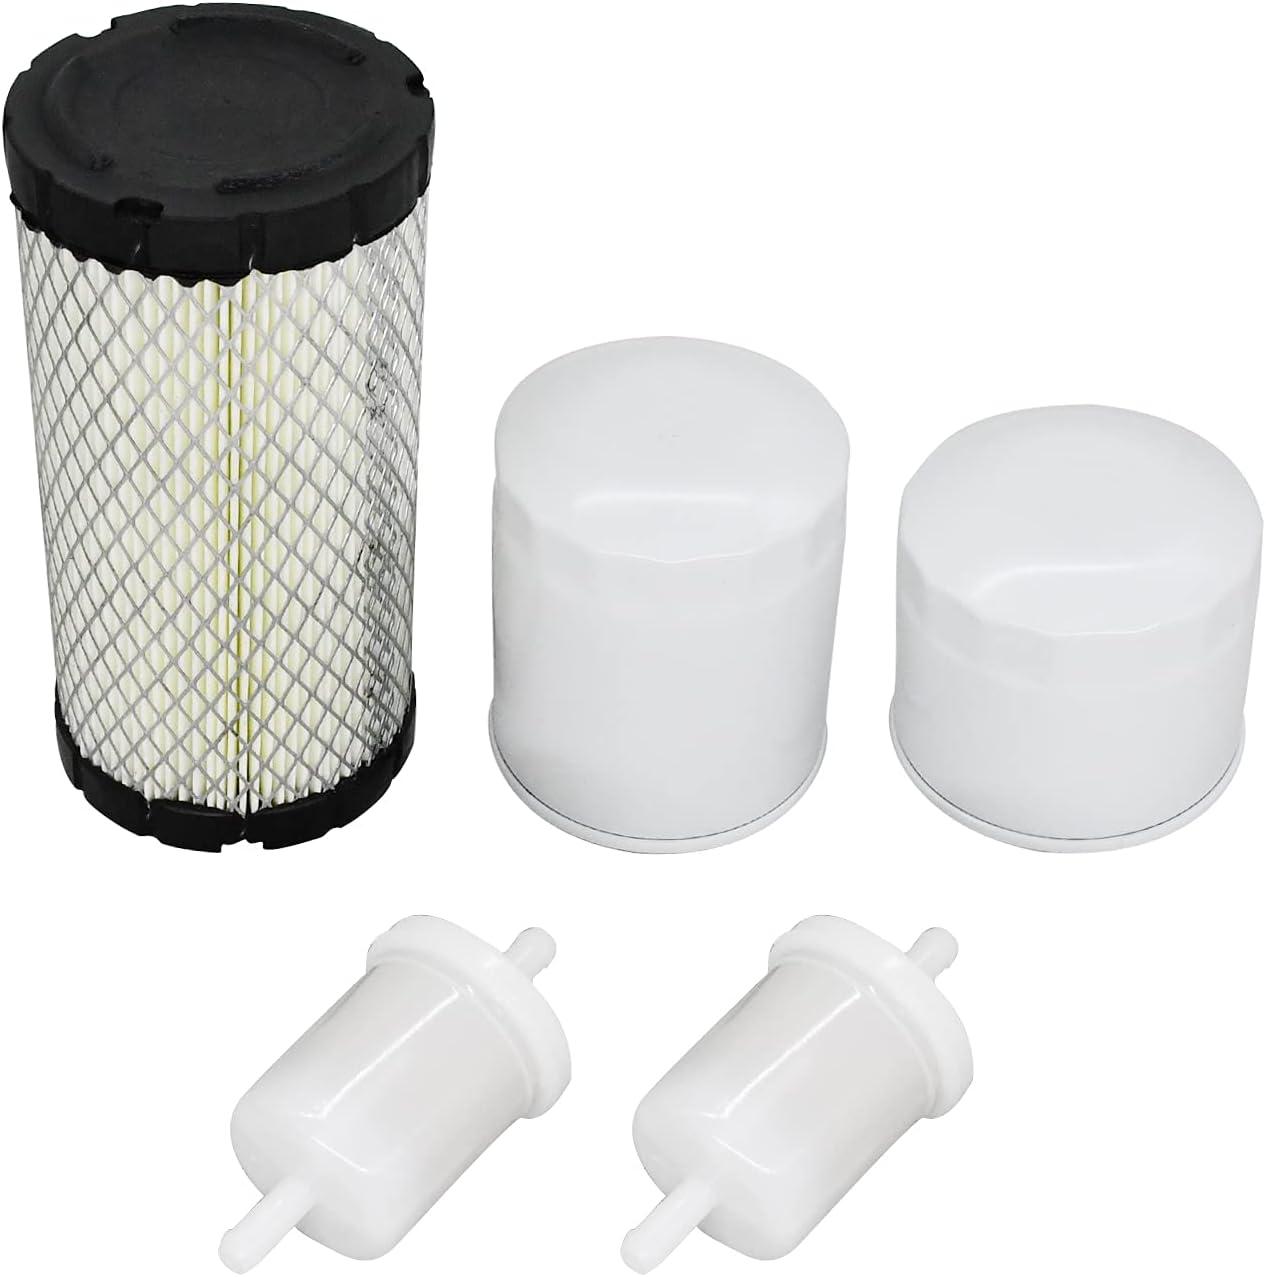 Disenparts Overseas 2021 parallel import regular item Filter Kit K1211-82320 HH150-32094 12581-43010 HHK20-